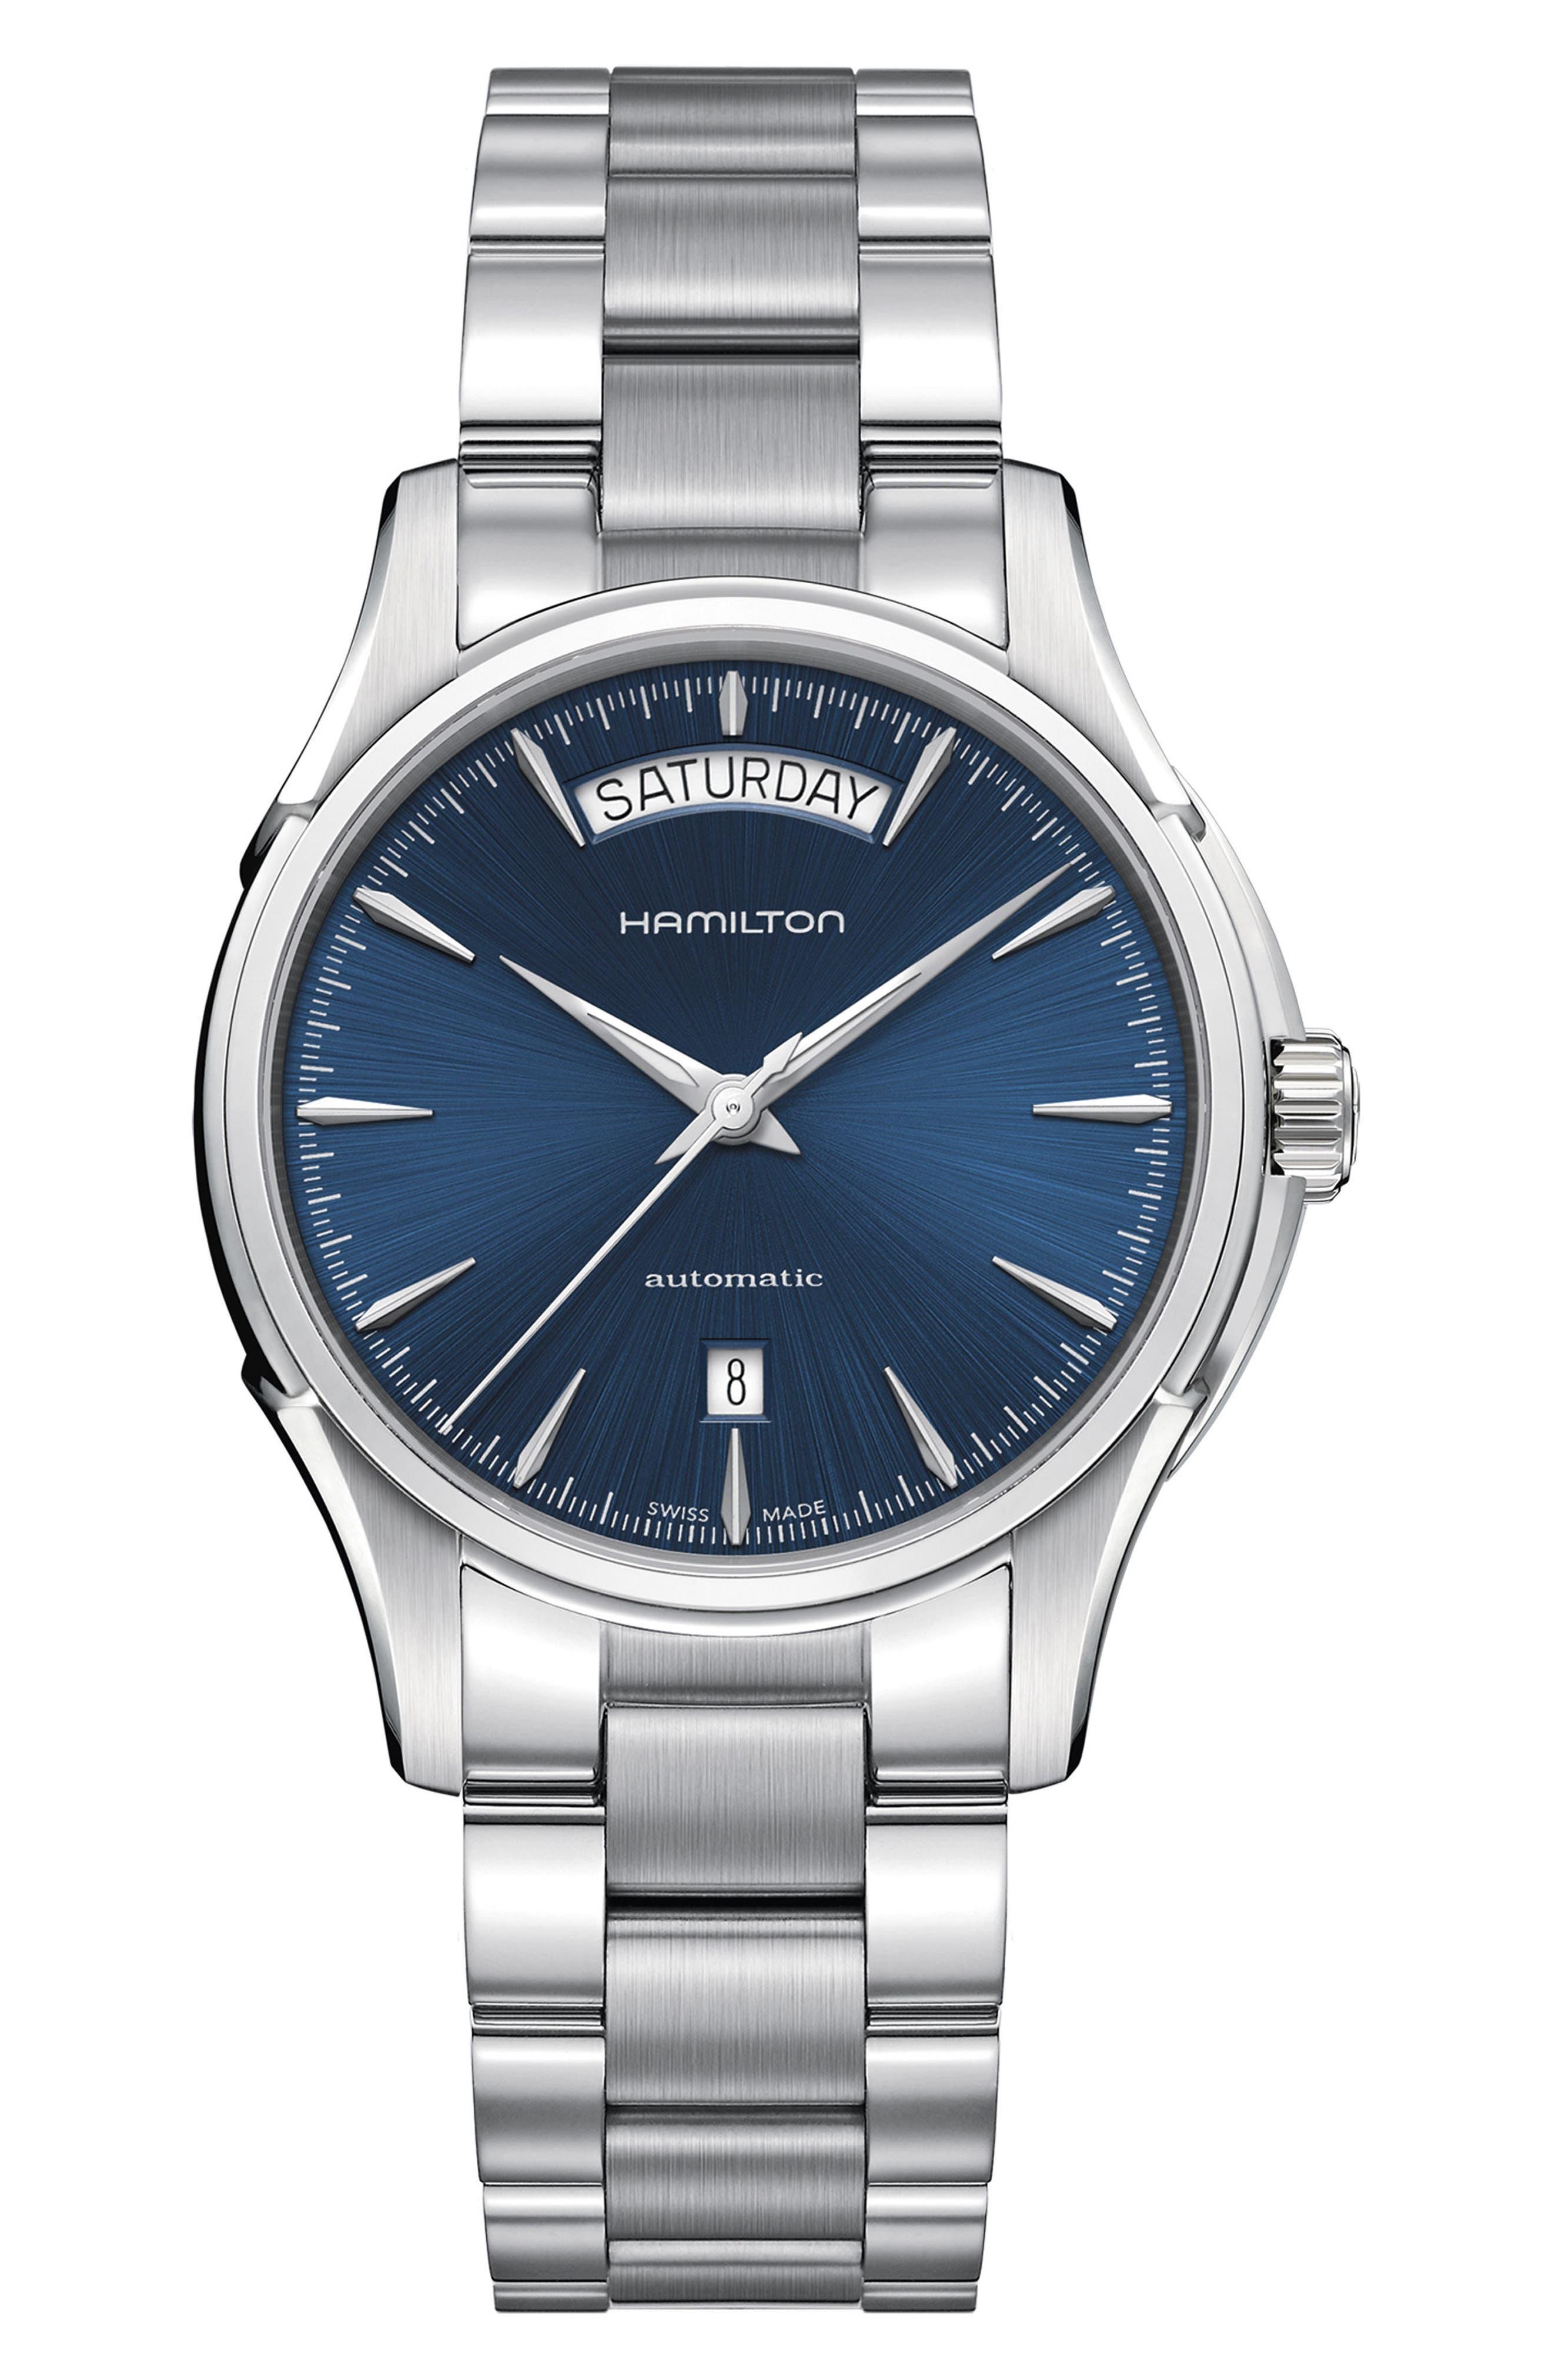 HAMILTON Jazzmaster Automatic Bracelet Watch, 40mm, Main, color, SILVER/ BLUE/ SILVER